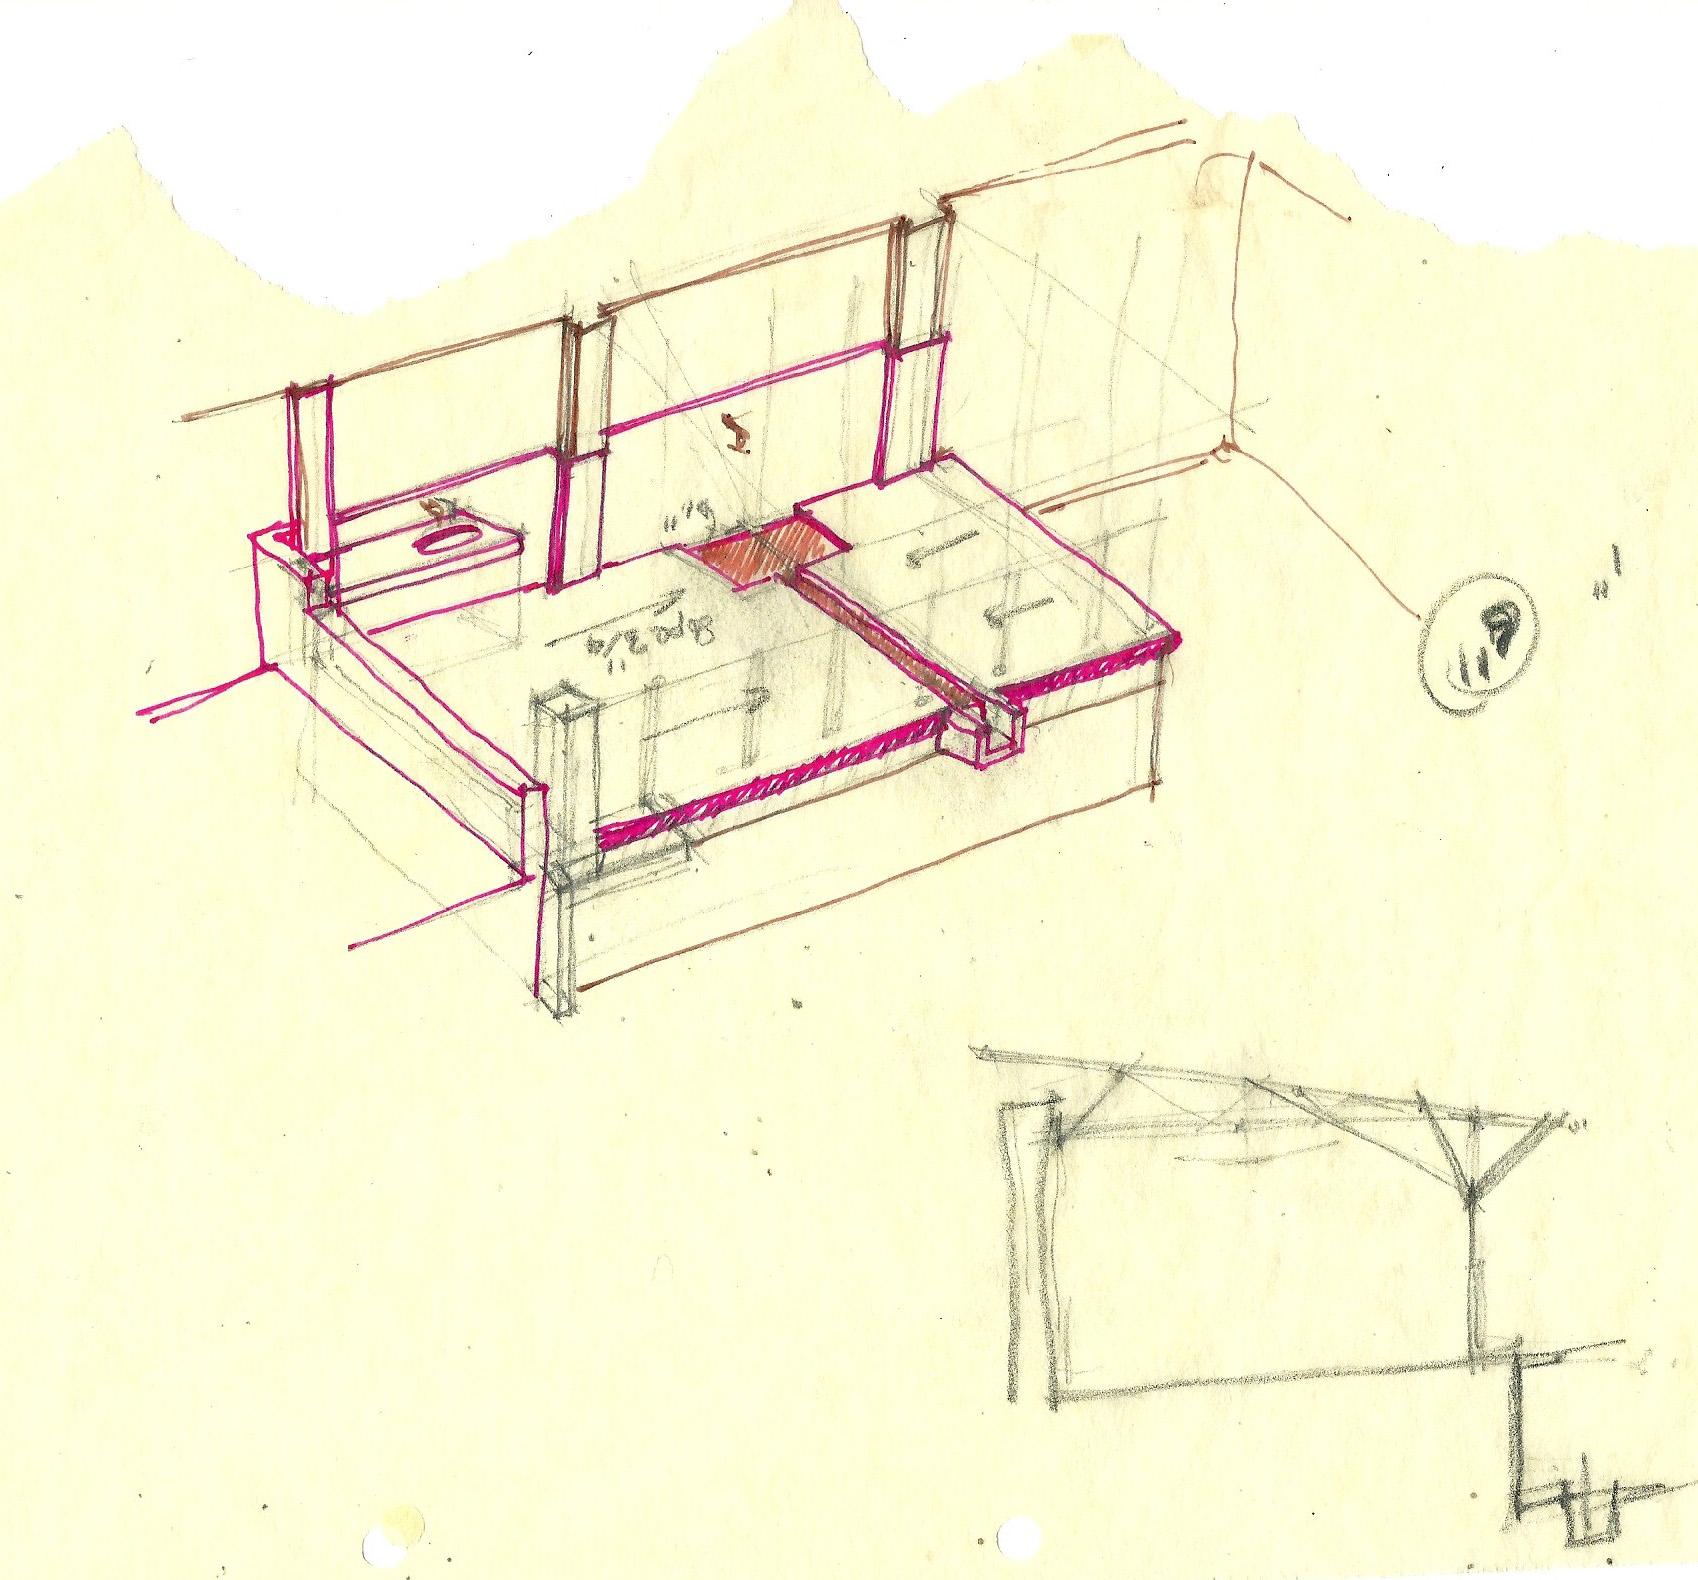 Archioppteryx-architects-puppy-pen-shelter-noida-india-sketch